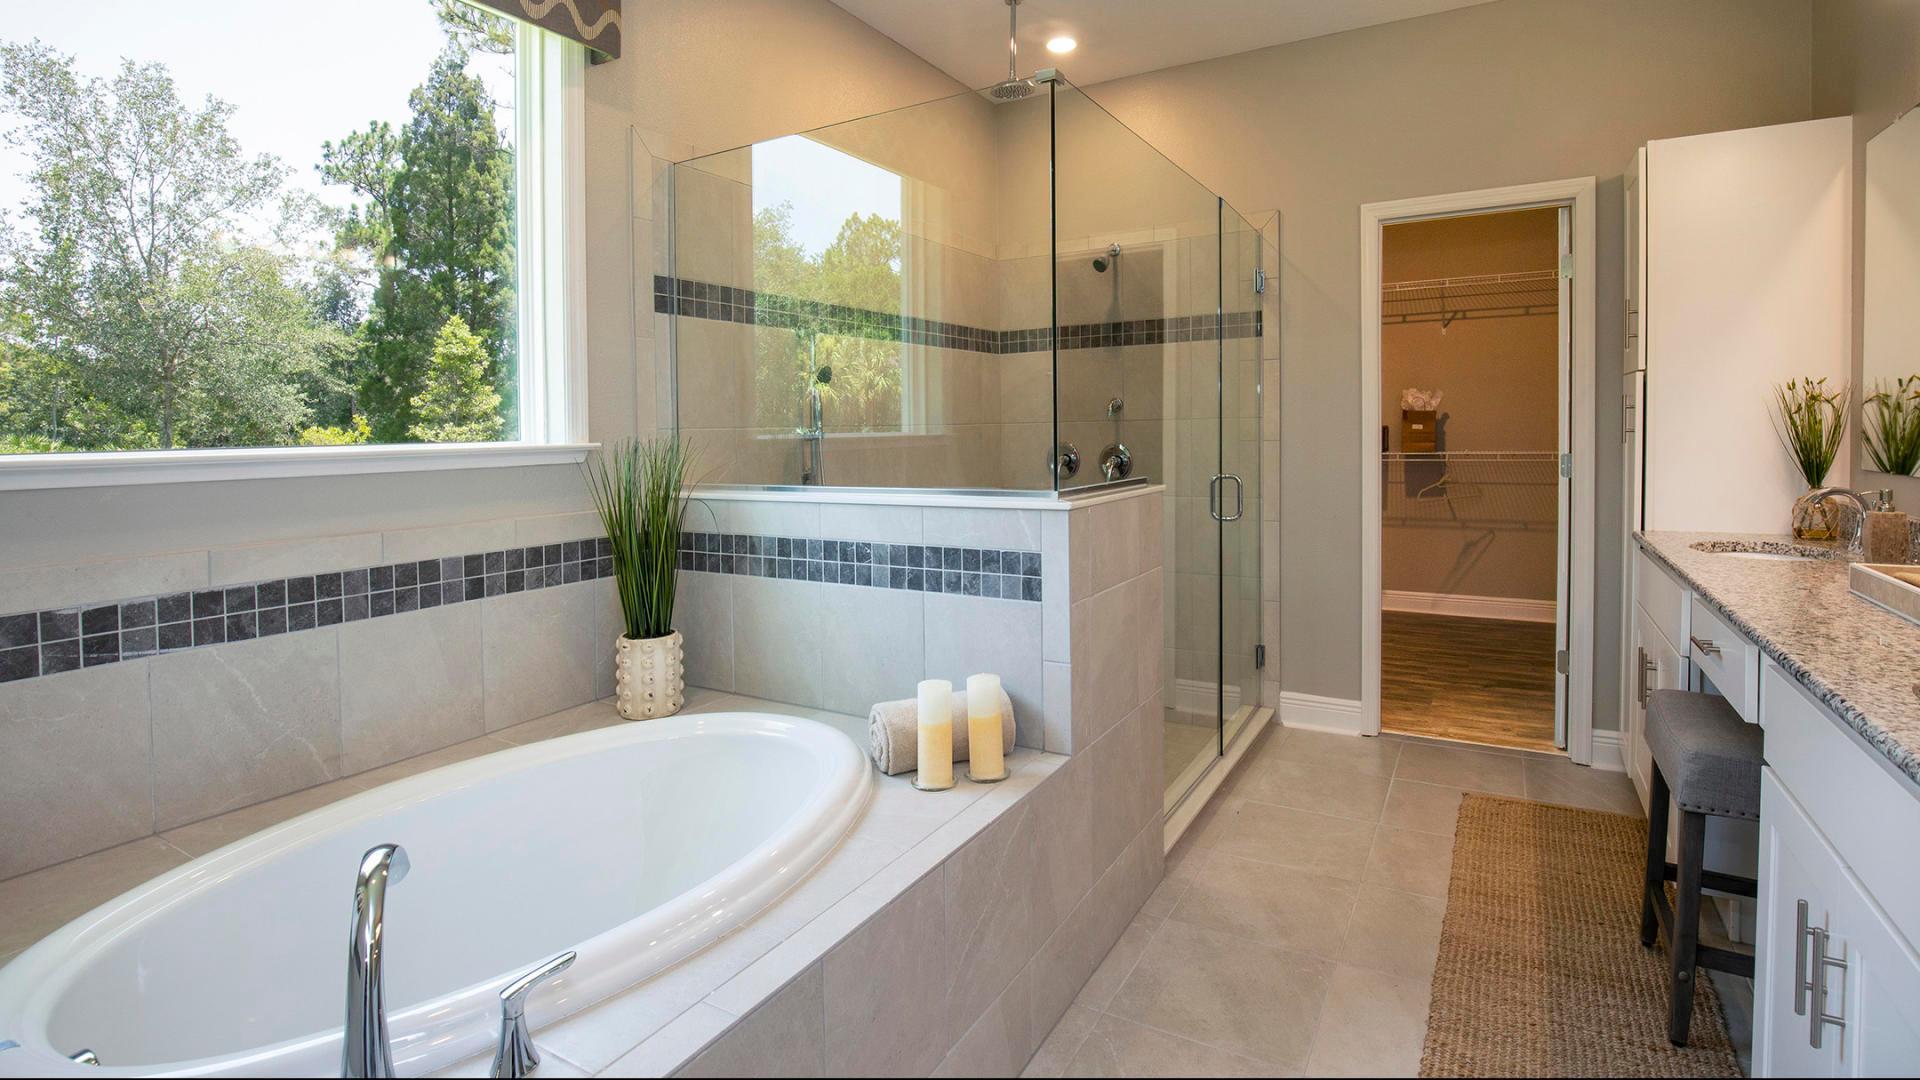 Bathroom featured in the Sienna By Maronda Homes in Tampa-St. Petersburg, FL